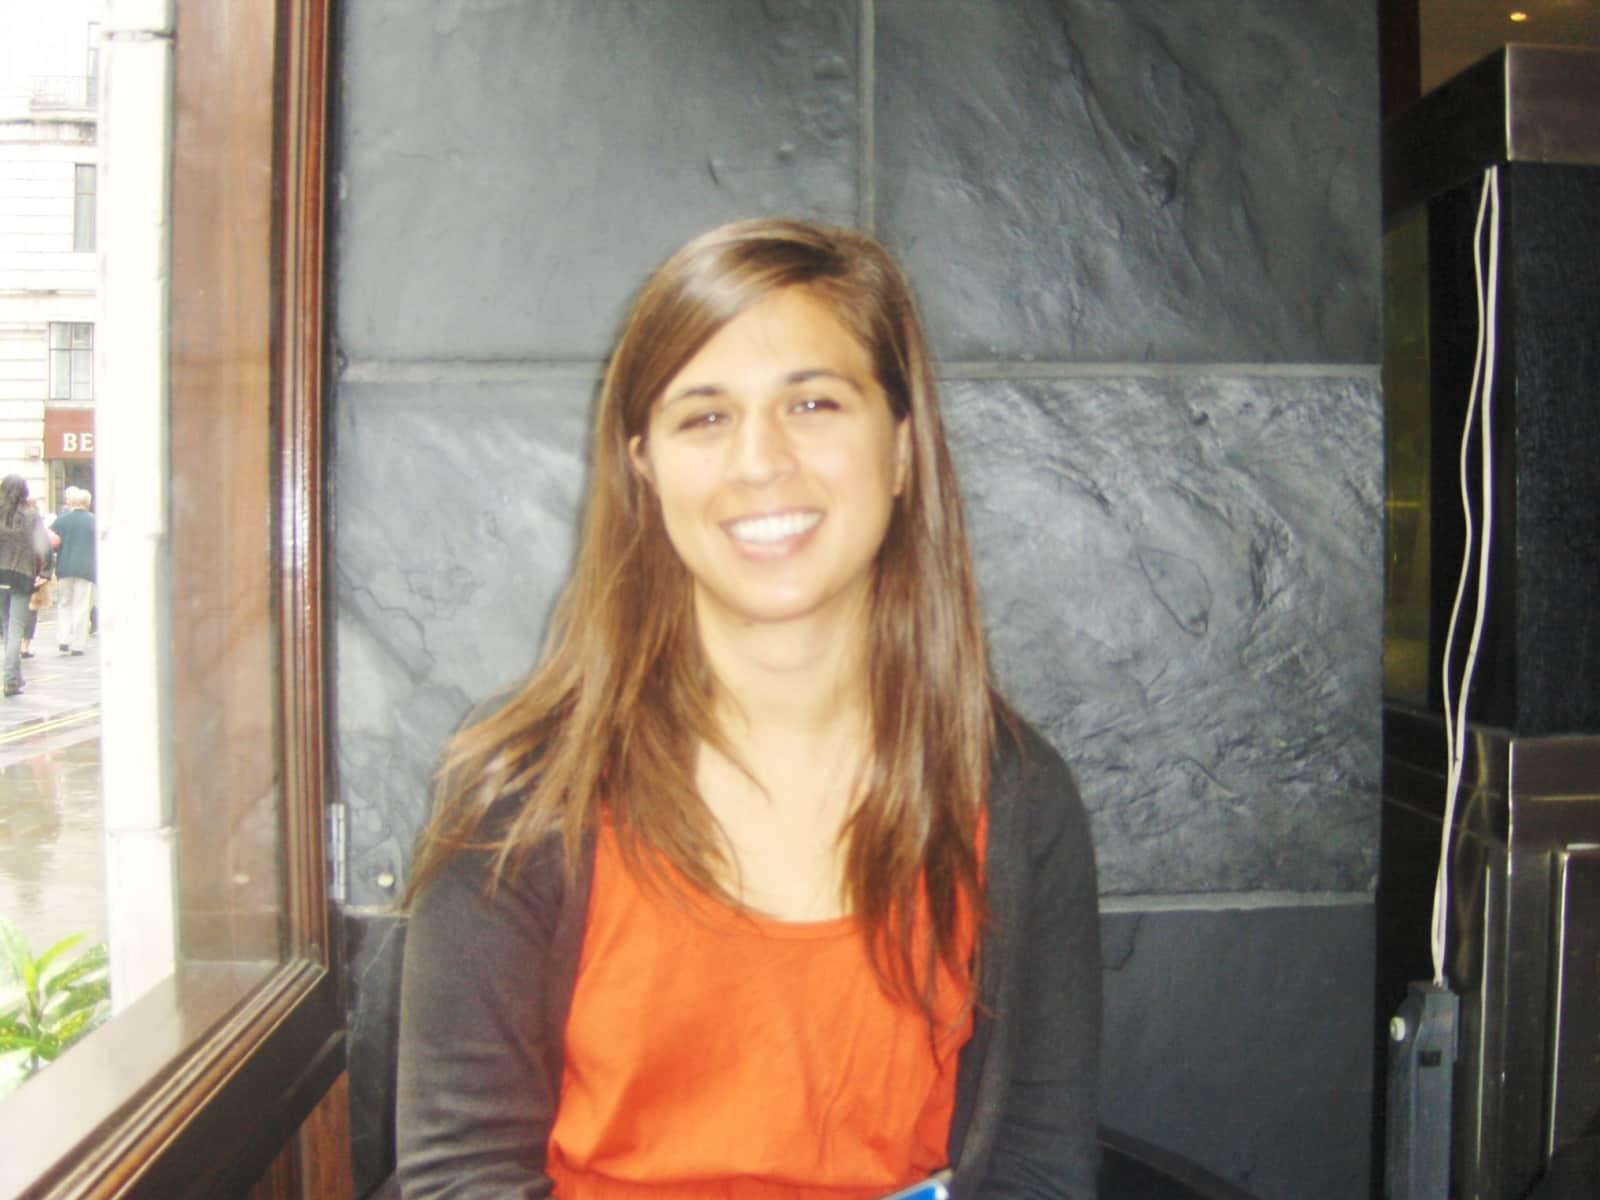 Sonita from Berlin, Germany